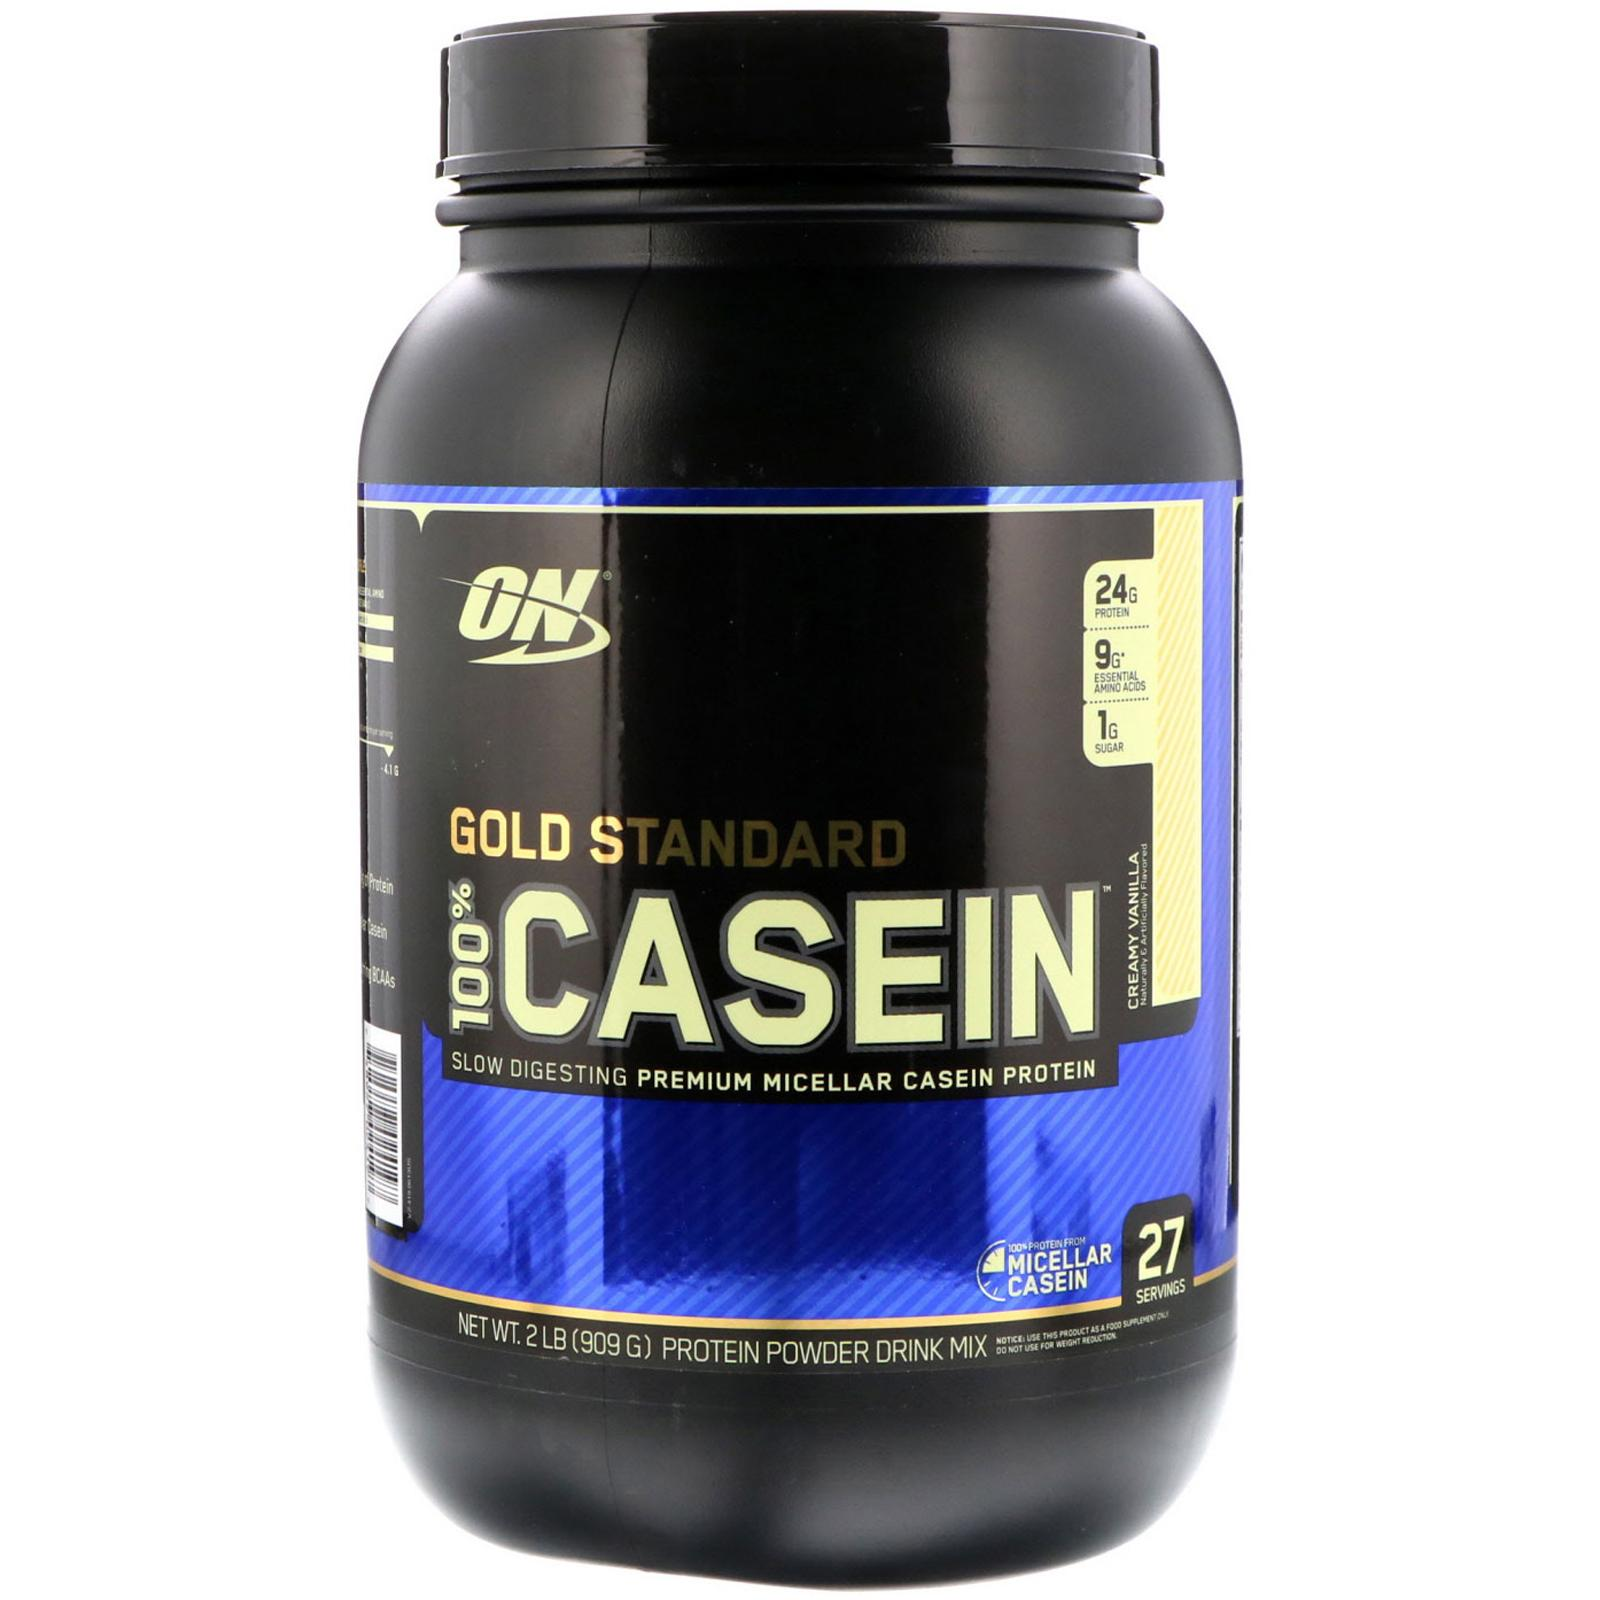 Thực phẩm bổ sung Optimum NutritionGold Standard 100% Casein Creamy Vanilla 2 lbs